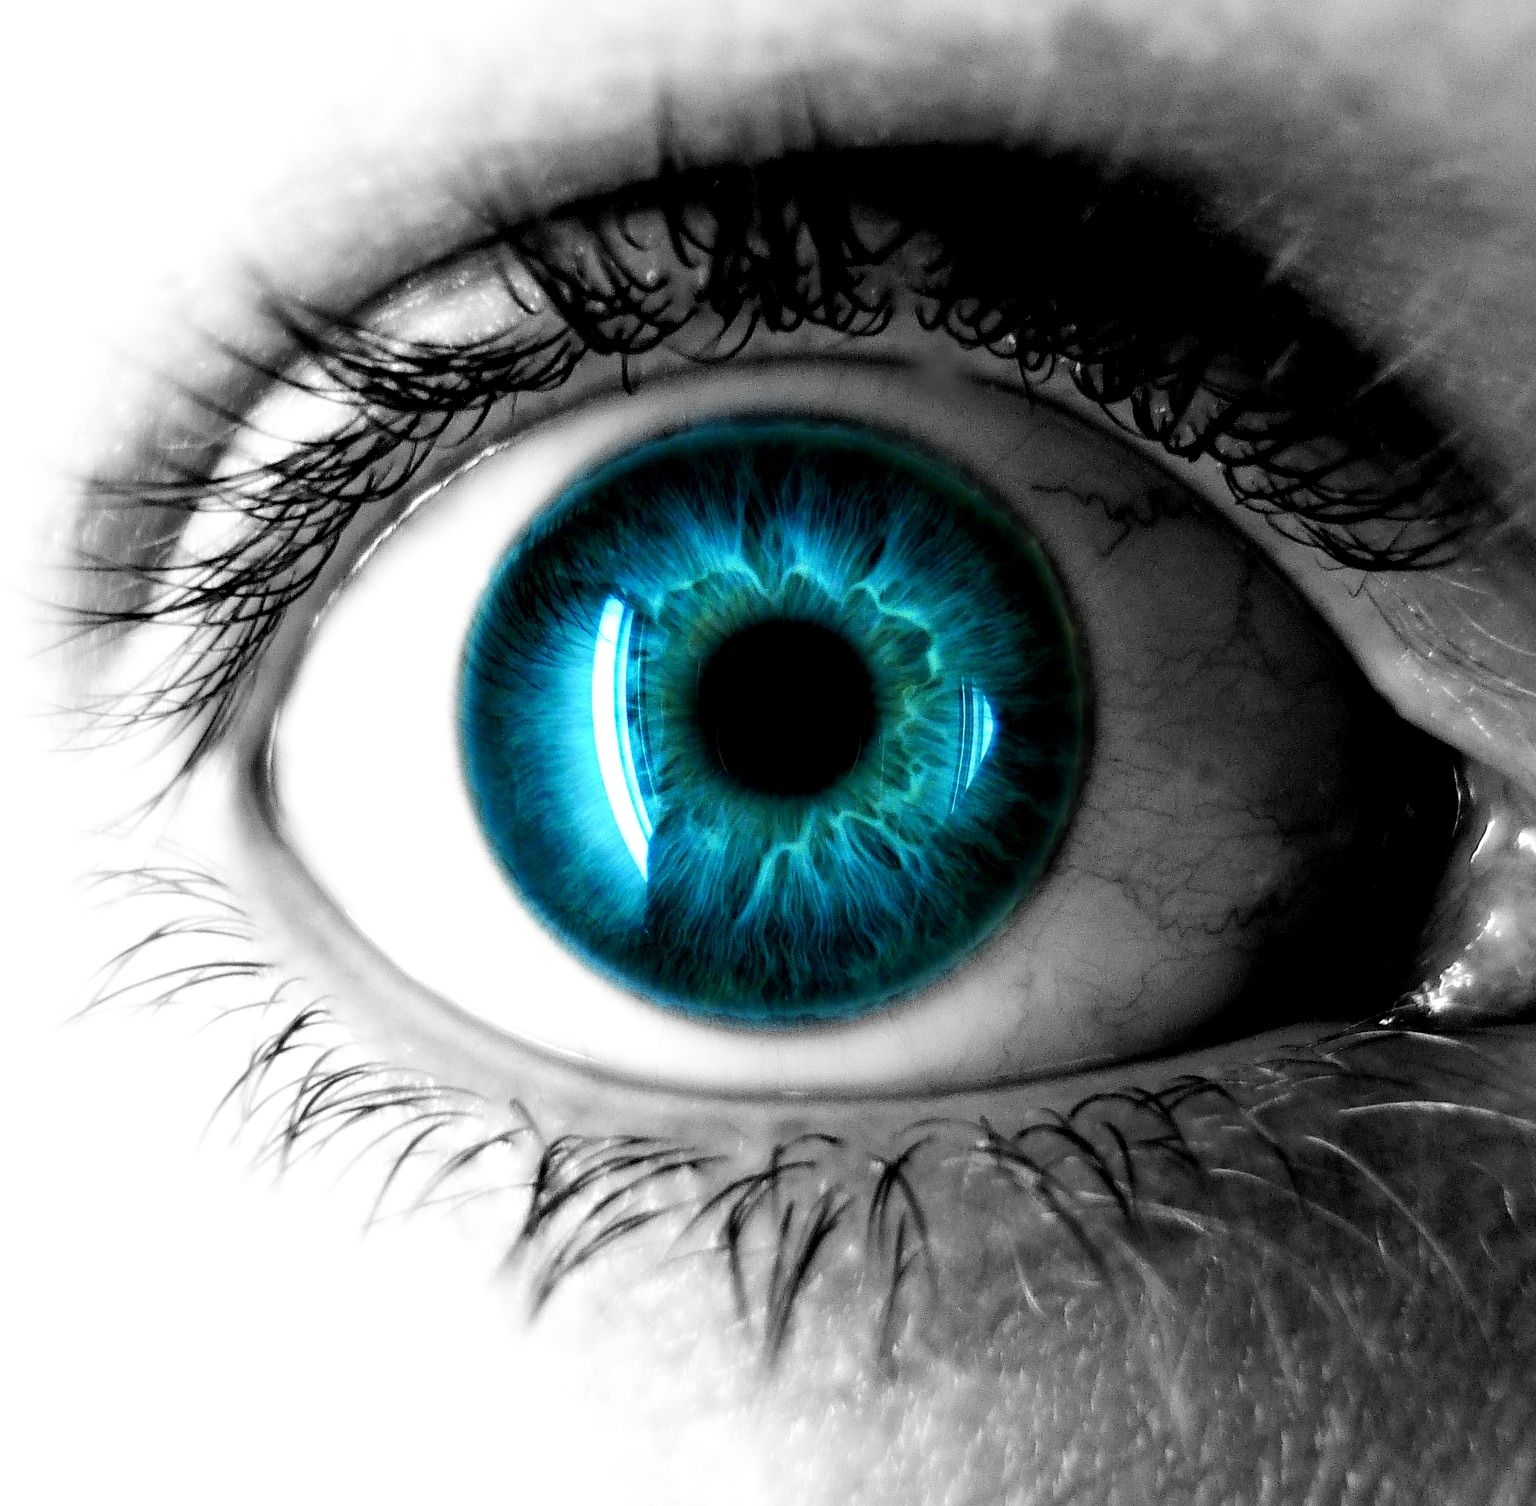 Cool Eyeball Wallpaper HD Download